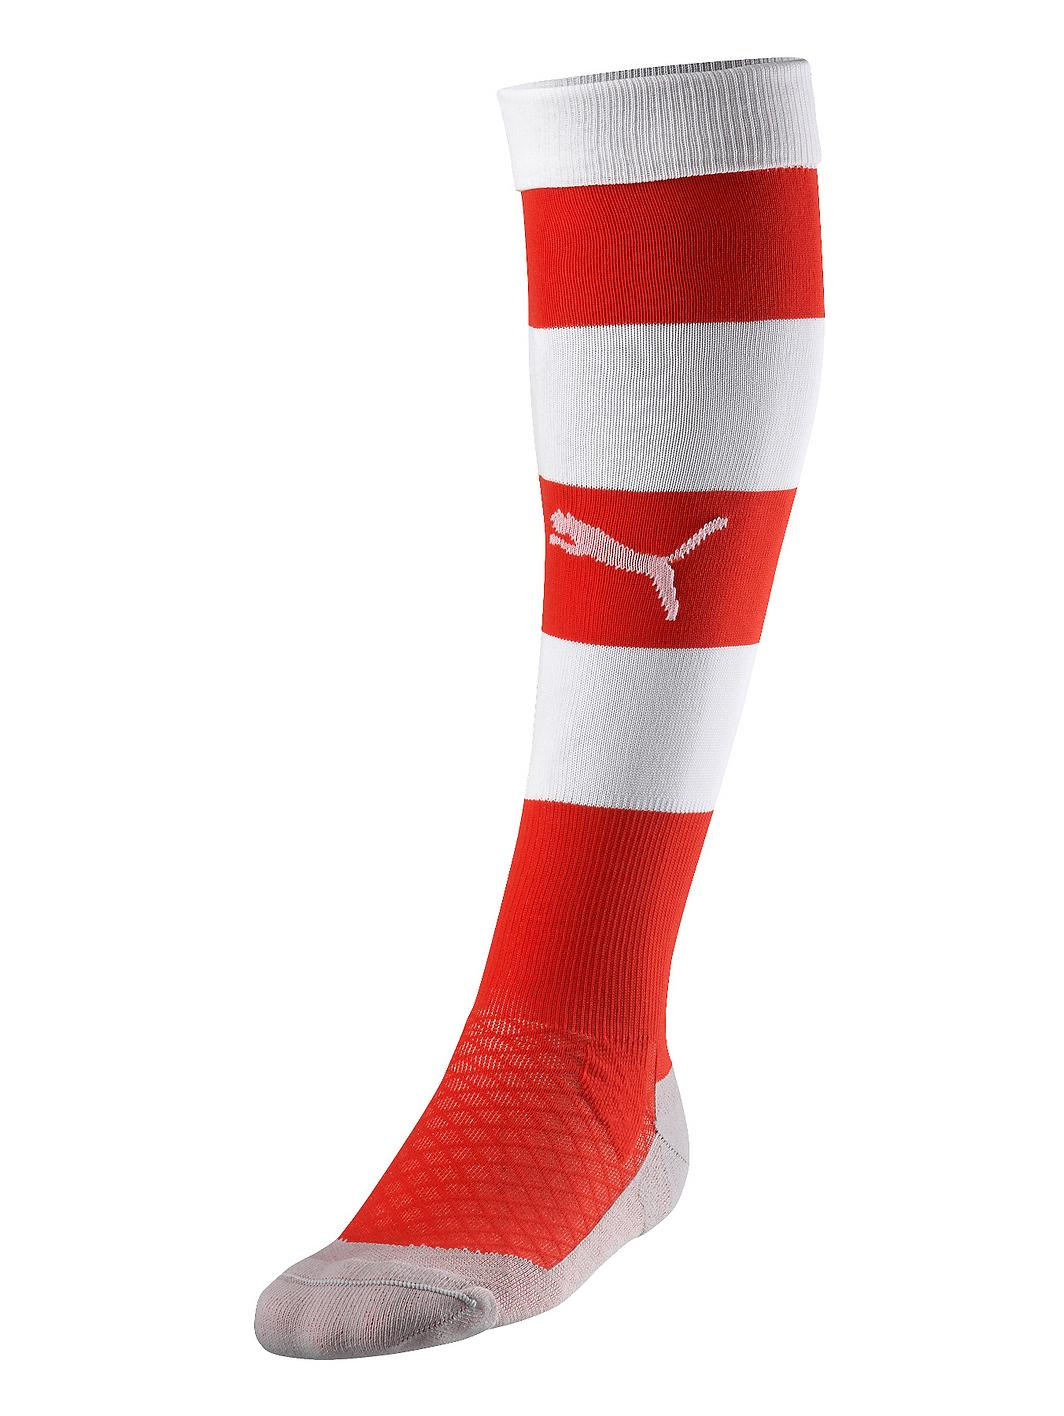 Kids Arsenal Football Socks Size   Shoe Size